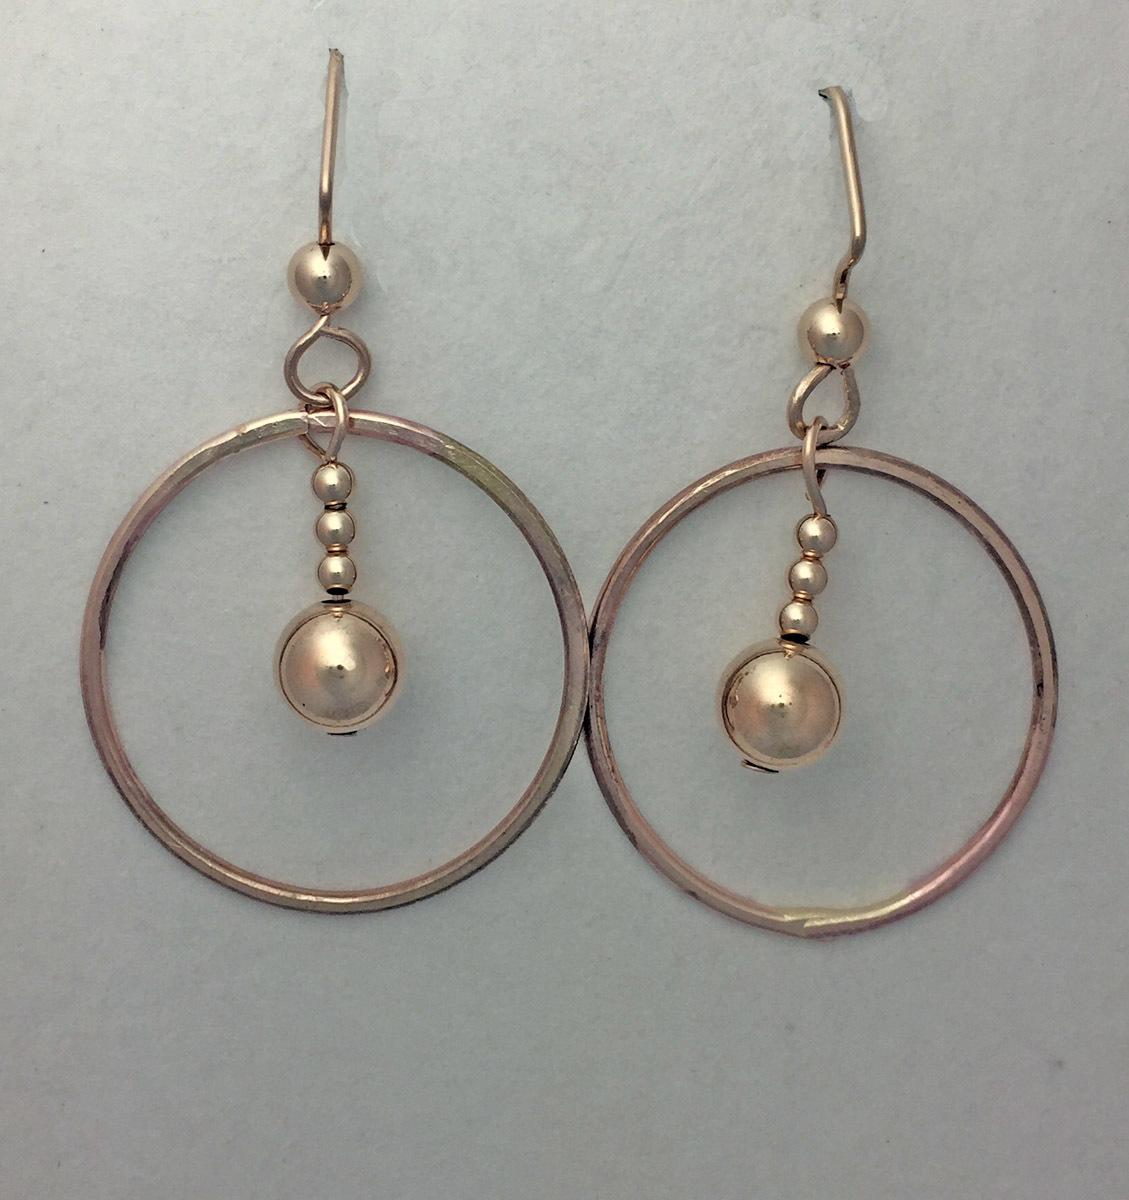 Hoop with Dangle Earrings (large view)